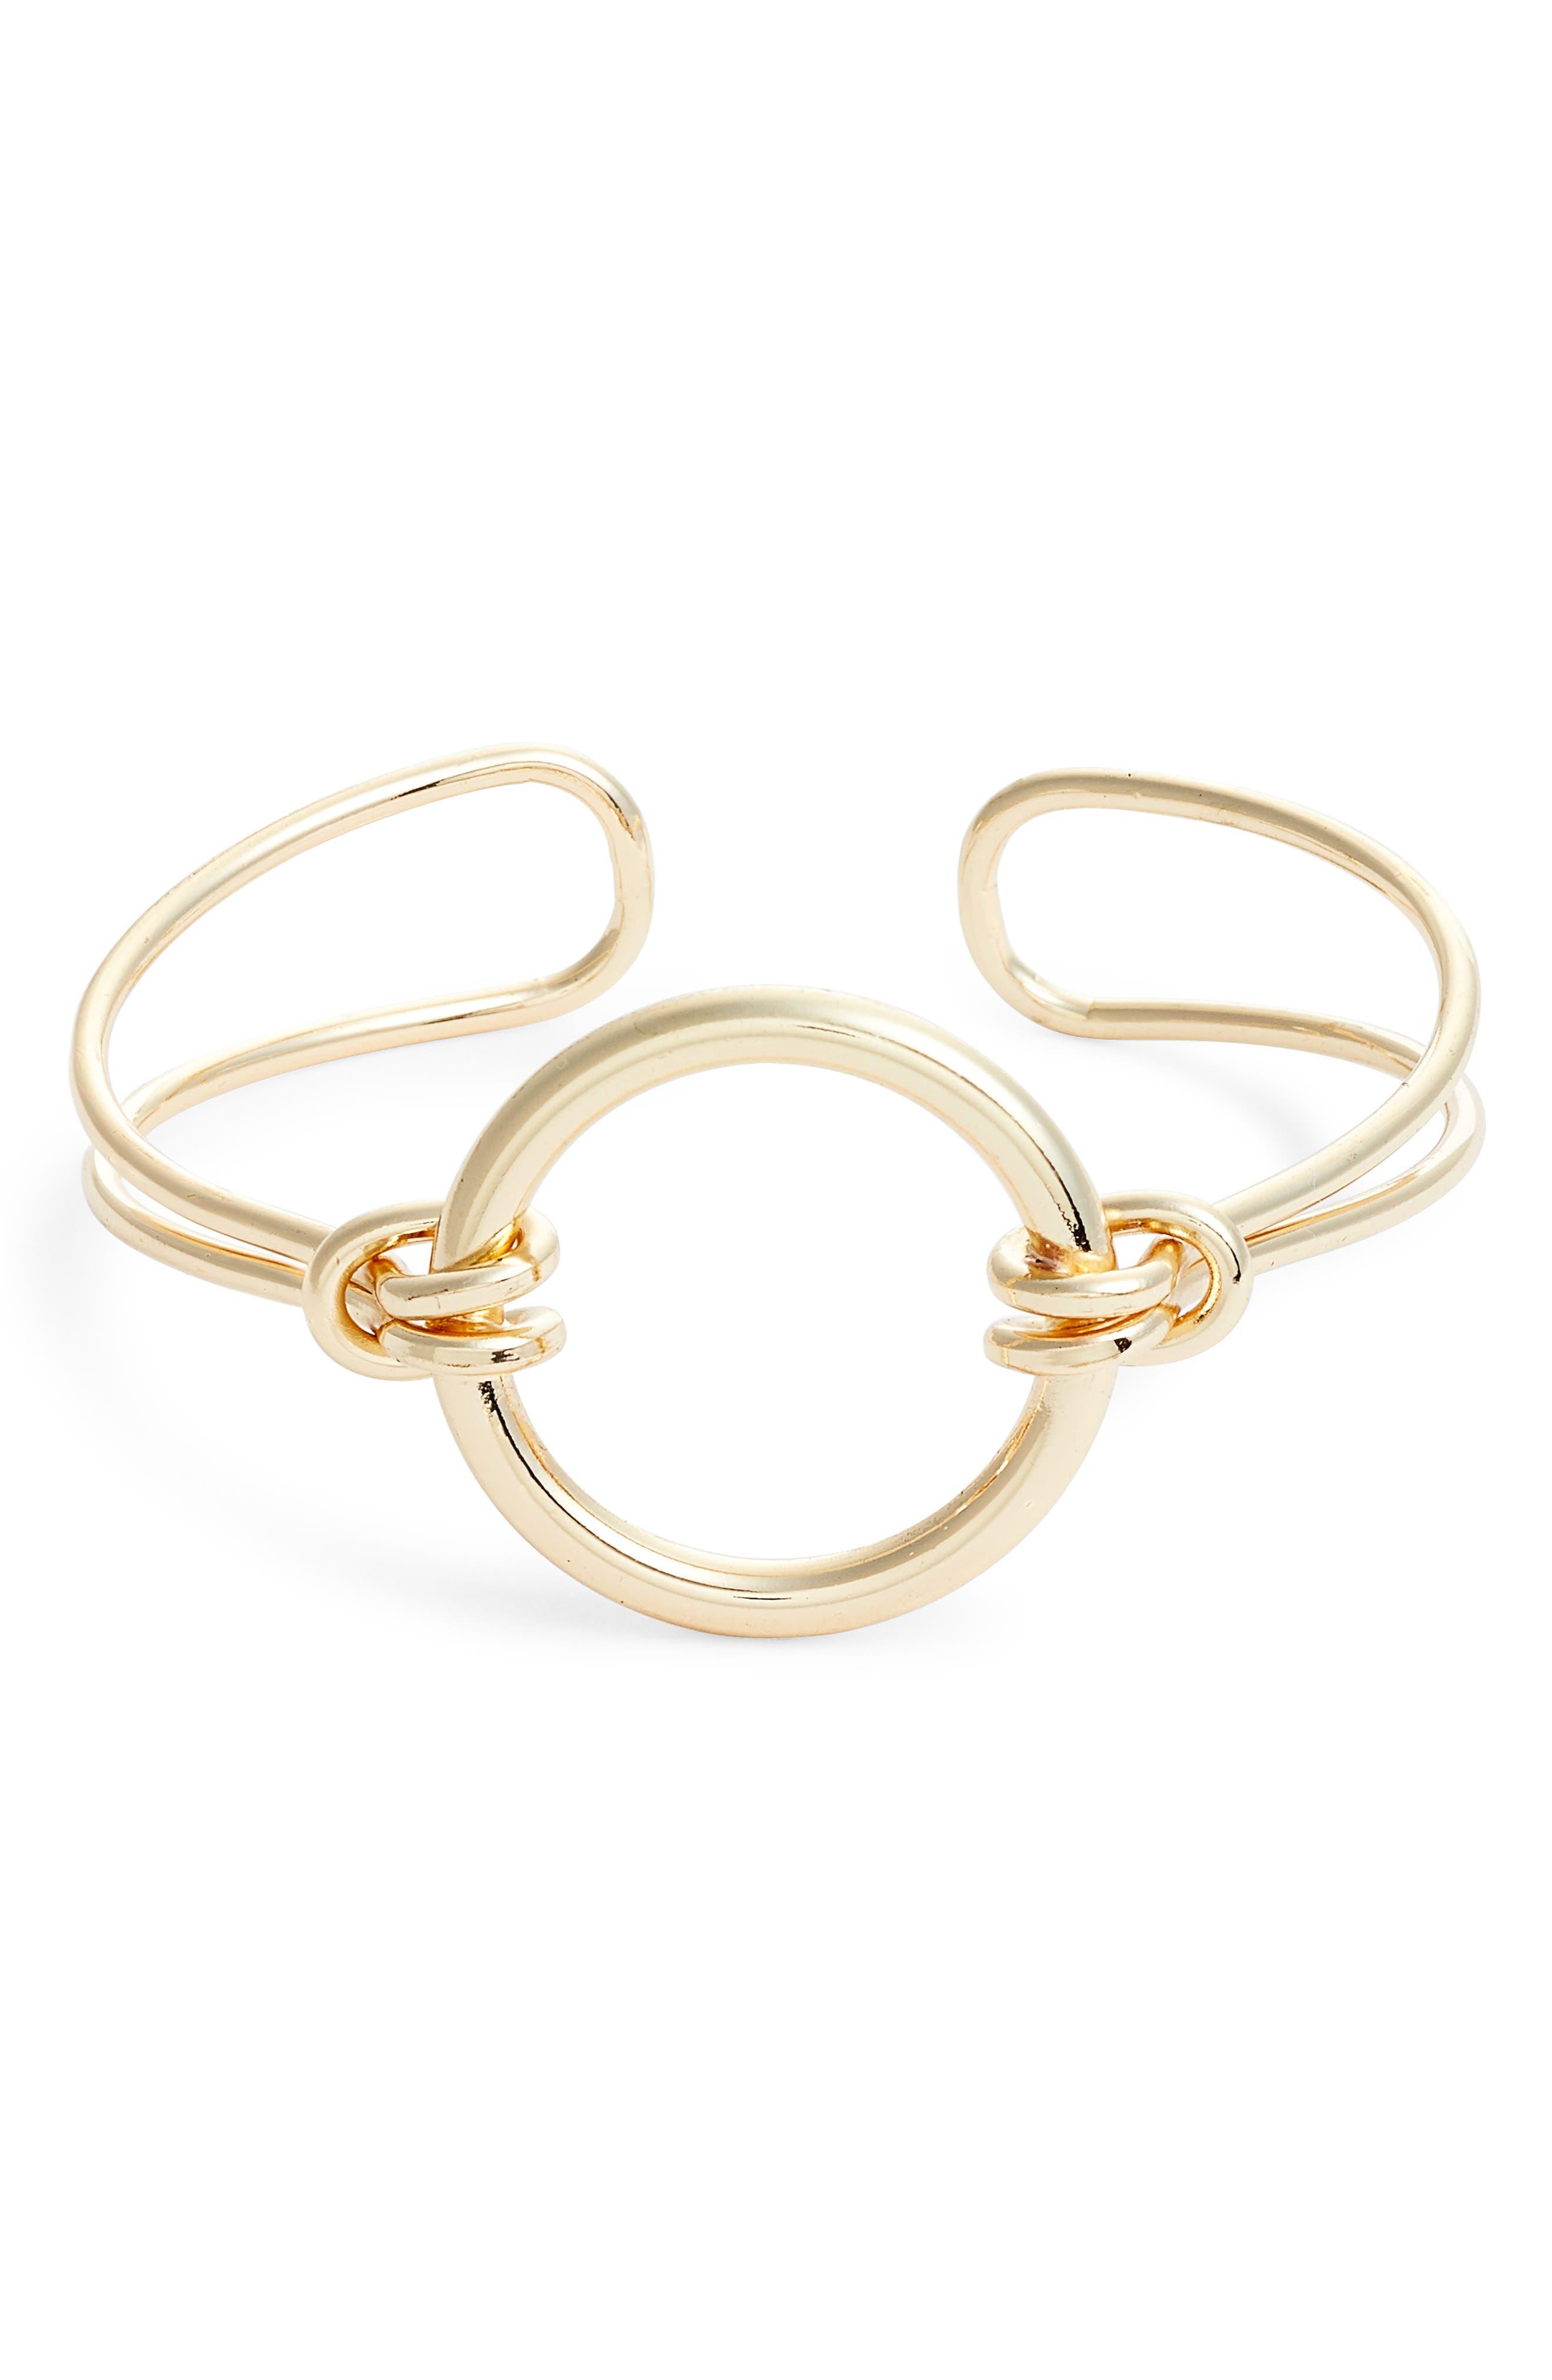 Circa Cuff Bracelet,                             Main thumbnail 1, color,                             Gold